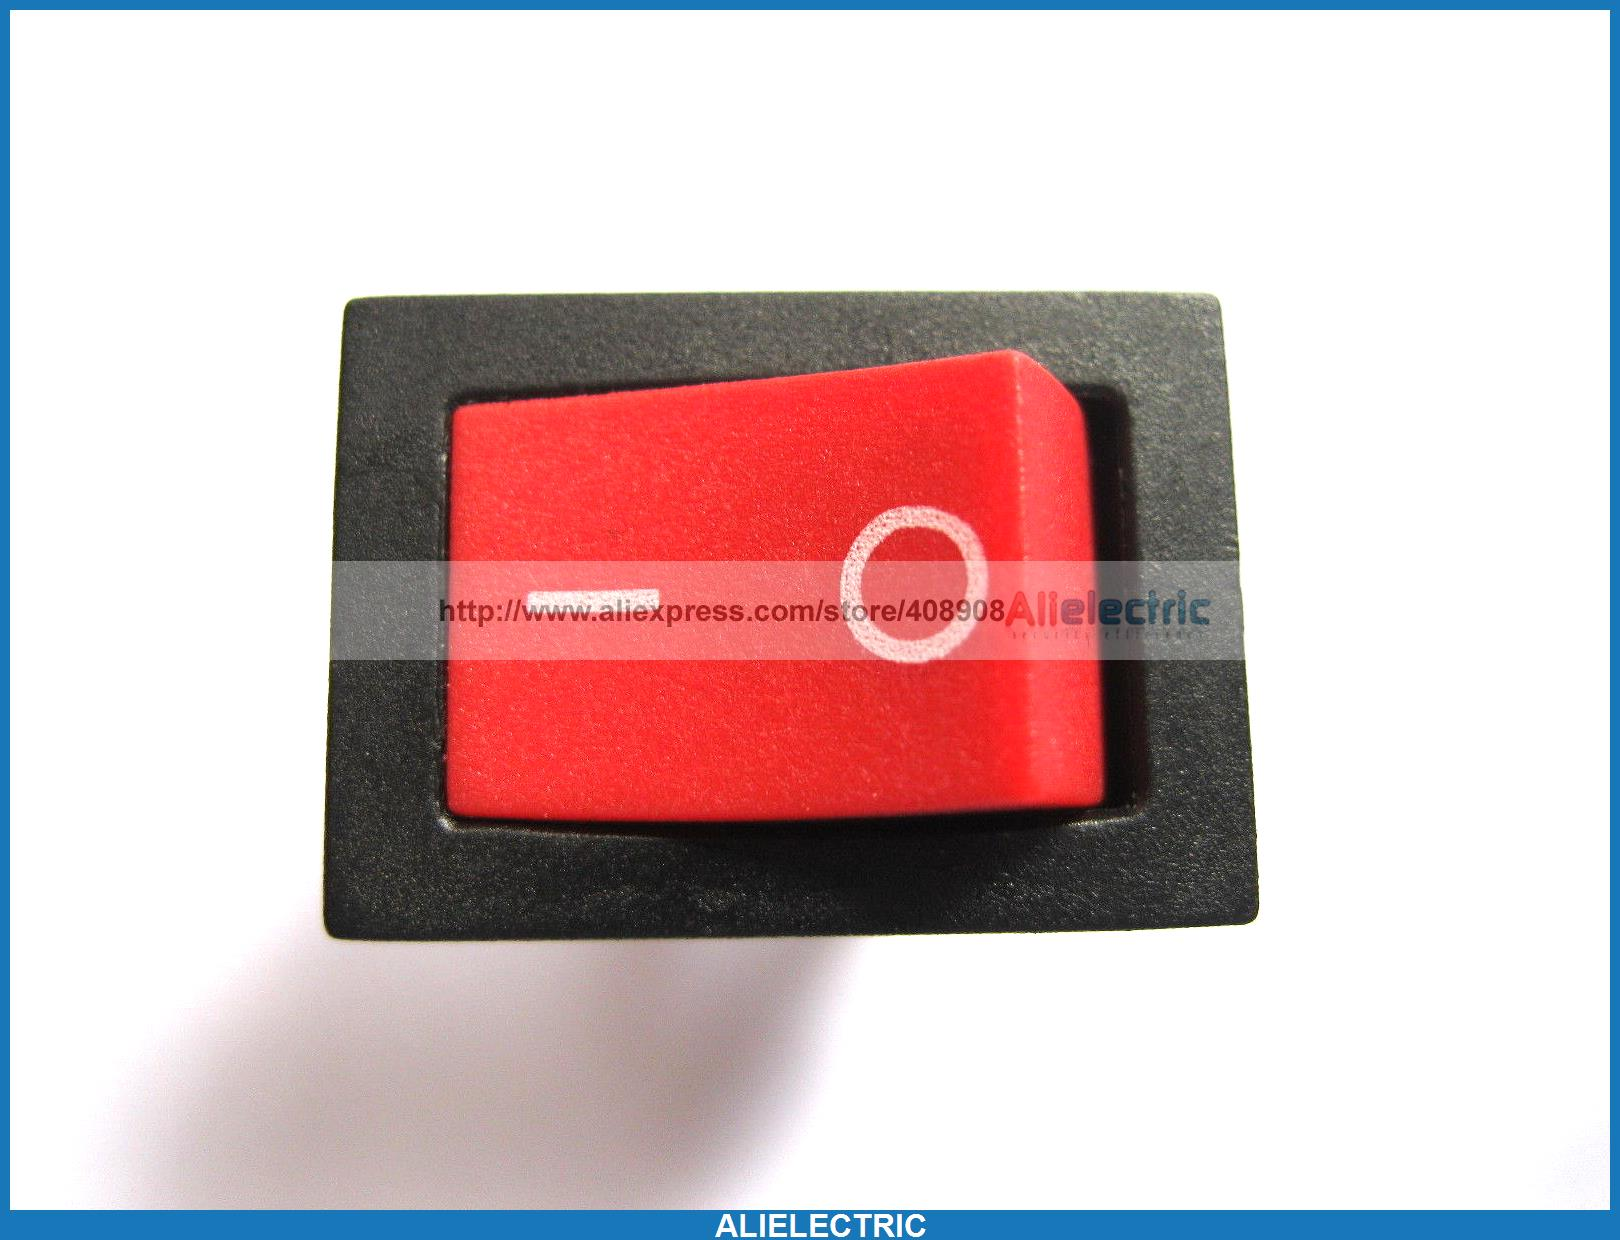 200 Pcs Rocker Switch KCD1 on Off Red Cap 2pin 6A 10A 21x15mm все цены